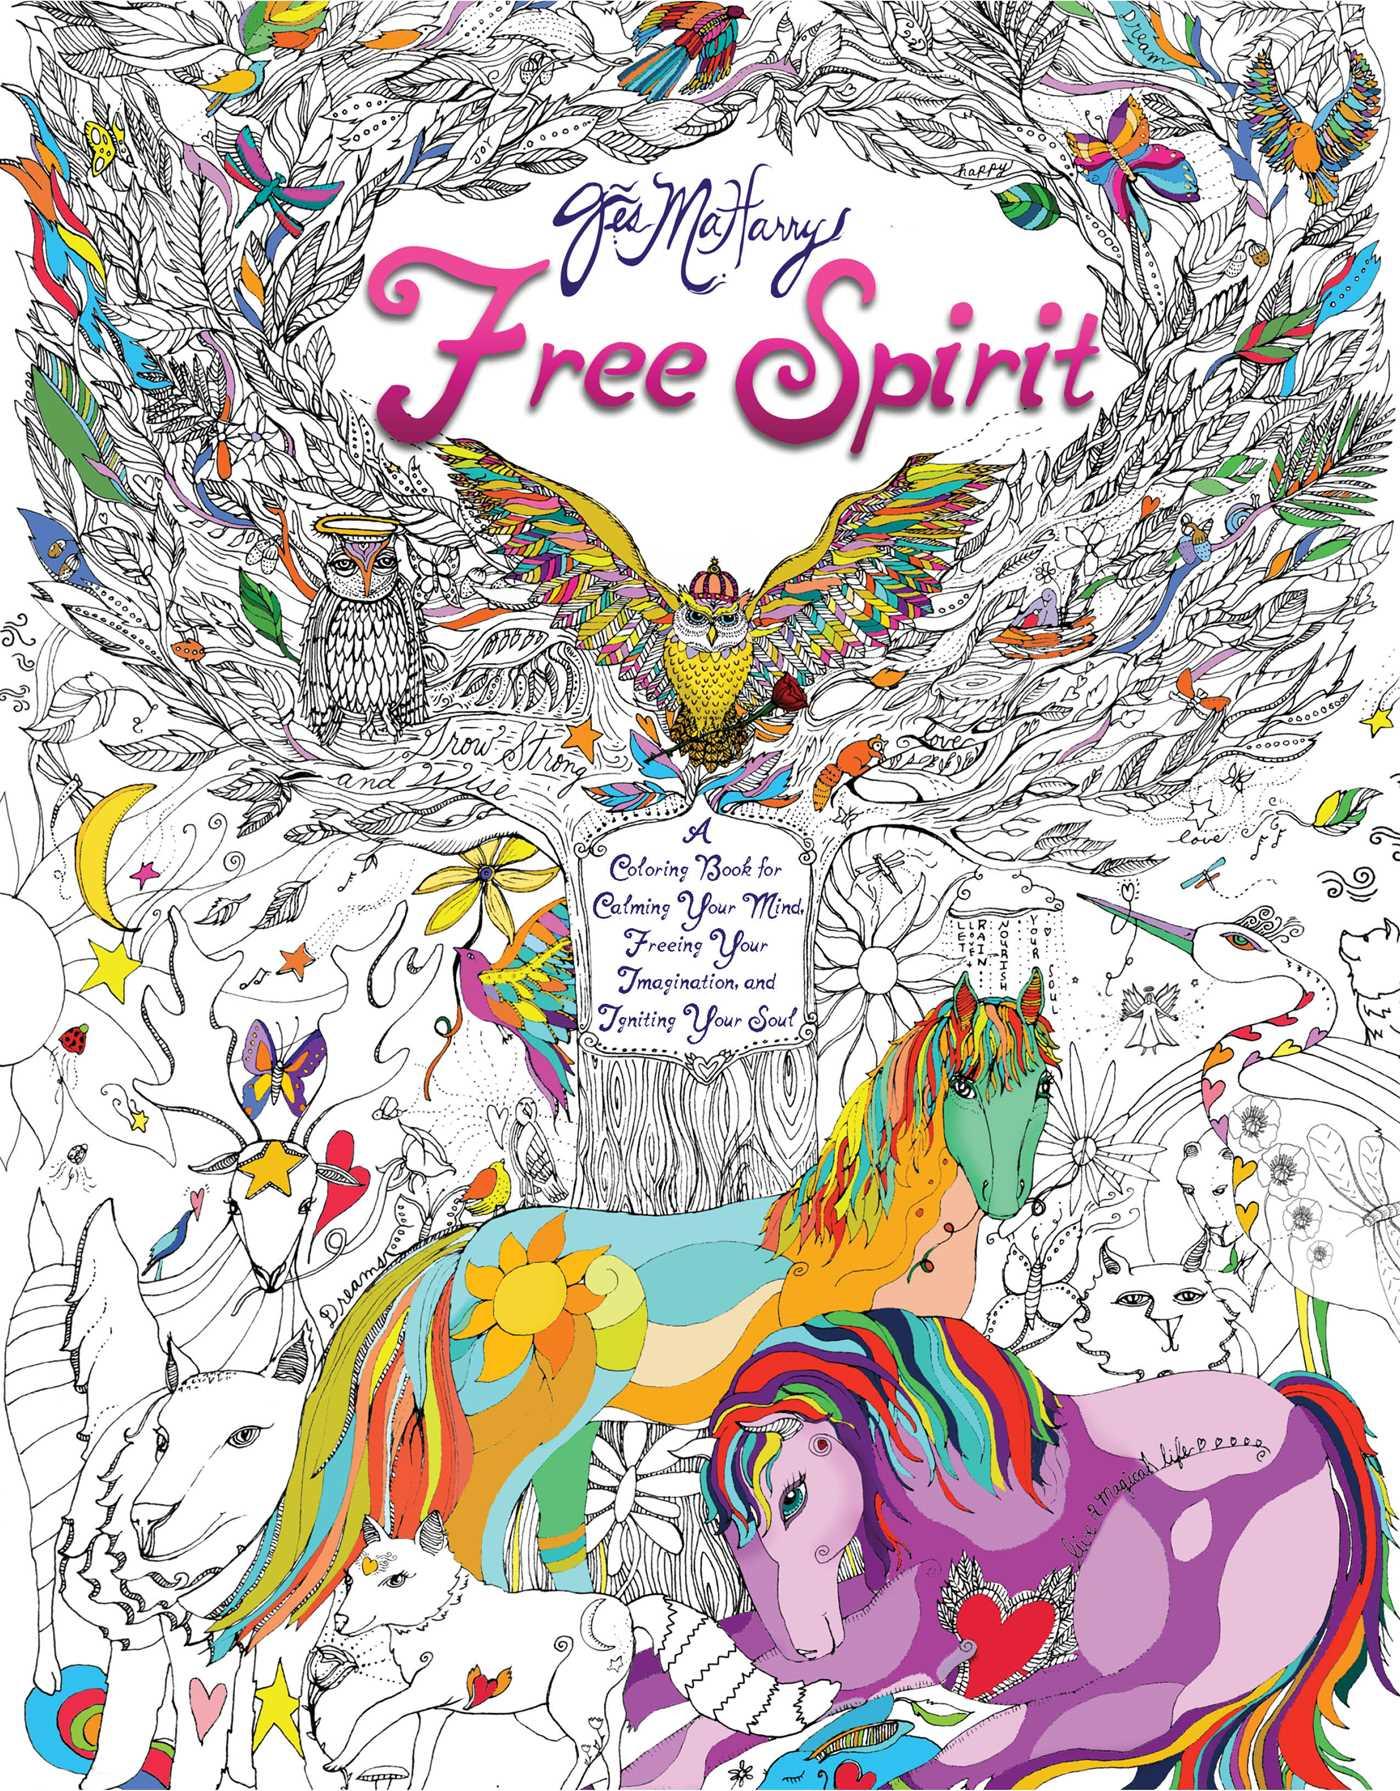 Free spirit 9781501134371 hr